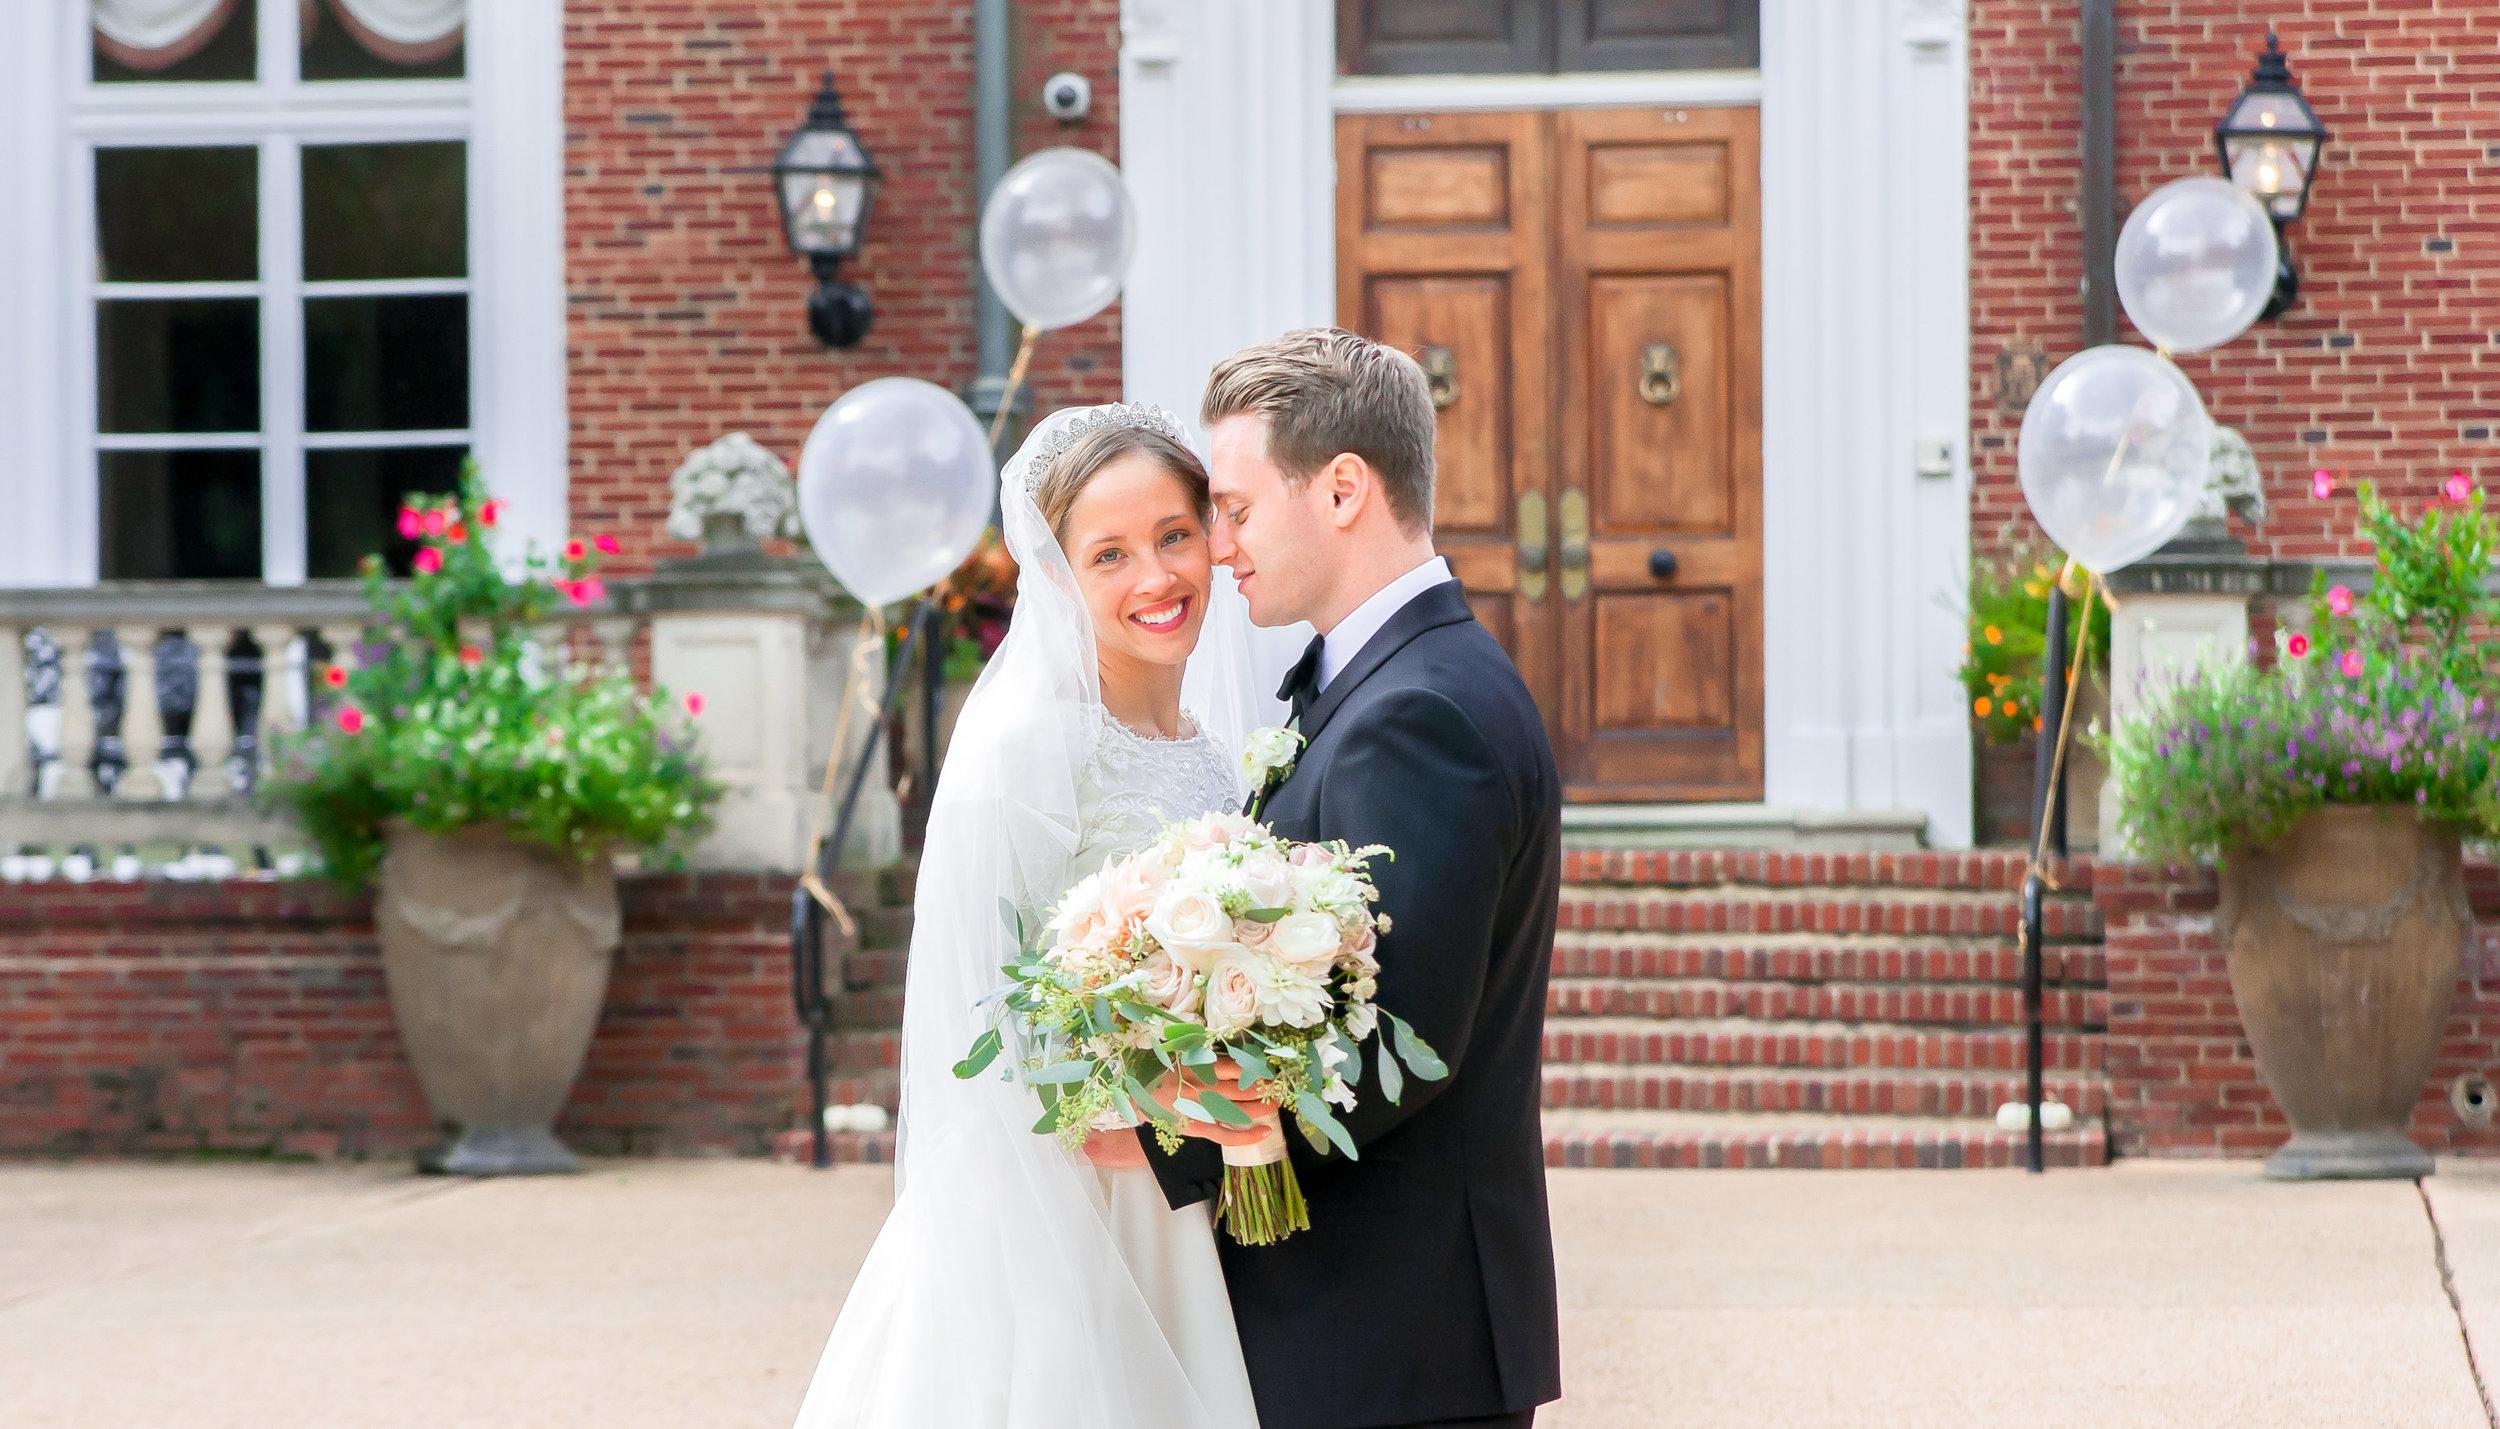 Oxon Hill Manor wedding photos of bride and groom by jessica nazarova